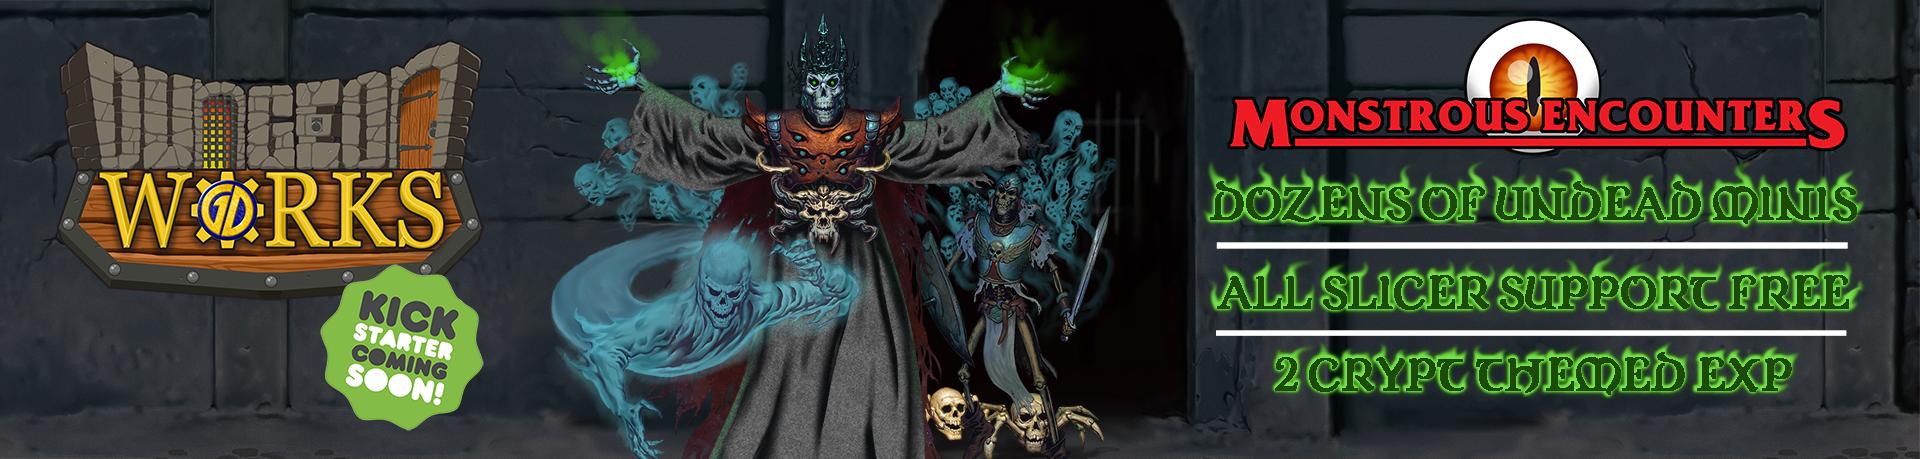 New DungeonWorks Kickstarter Coming Soon! Monstrous Encounters!